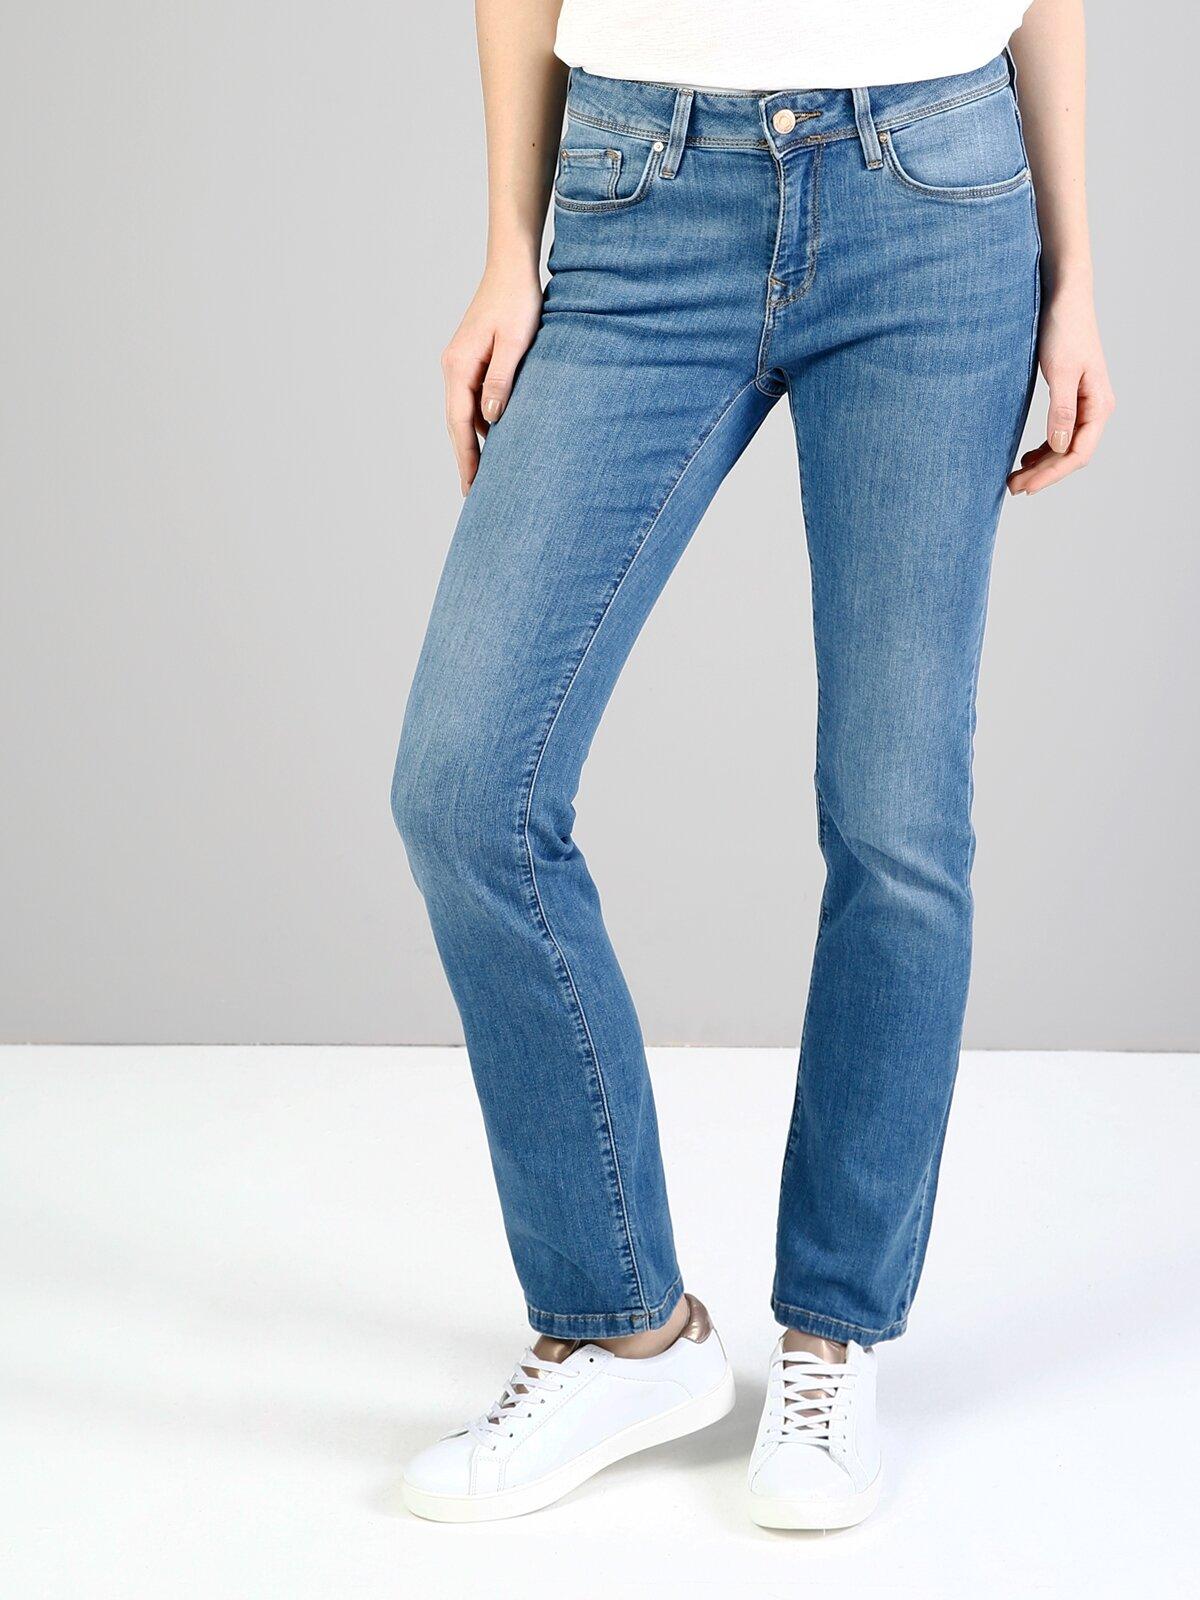 792 Mila Normal Kesim Orta Bel Düz Paça Mavi Jean Pantolon